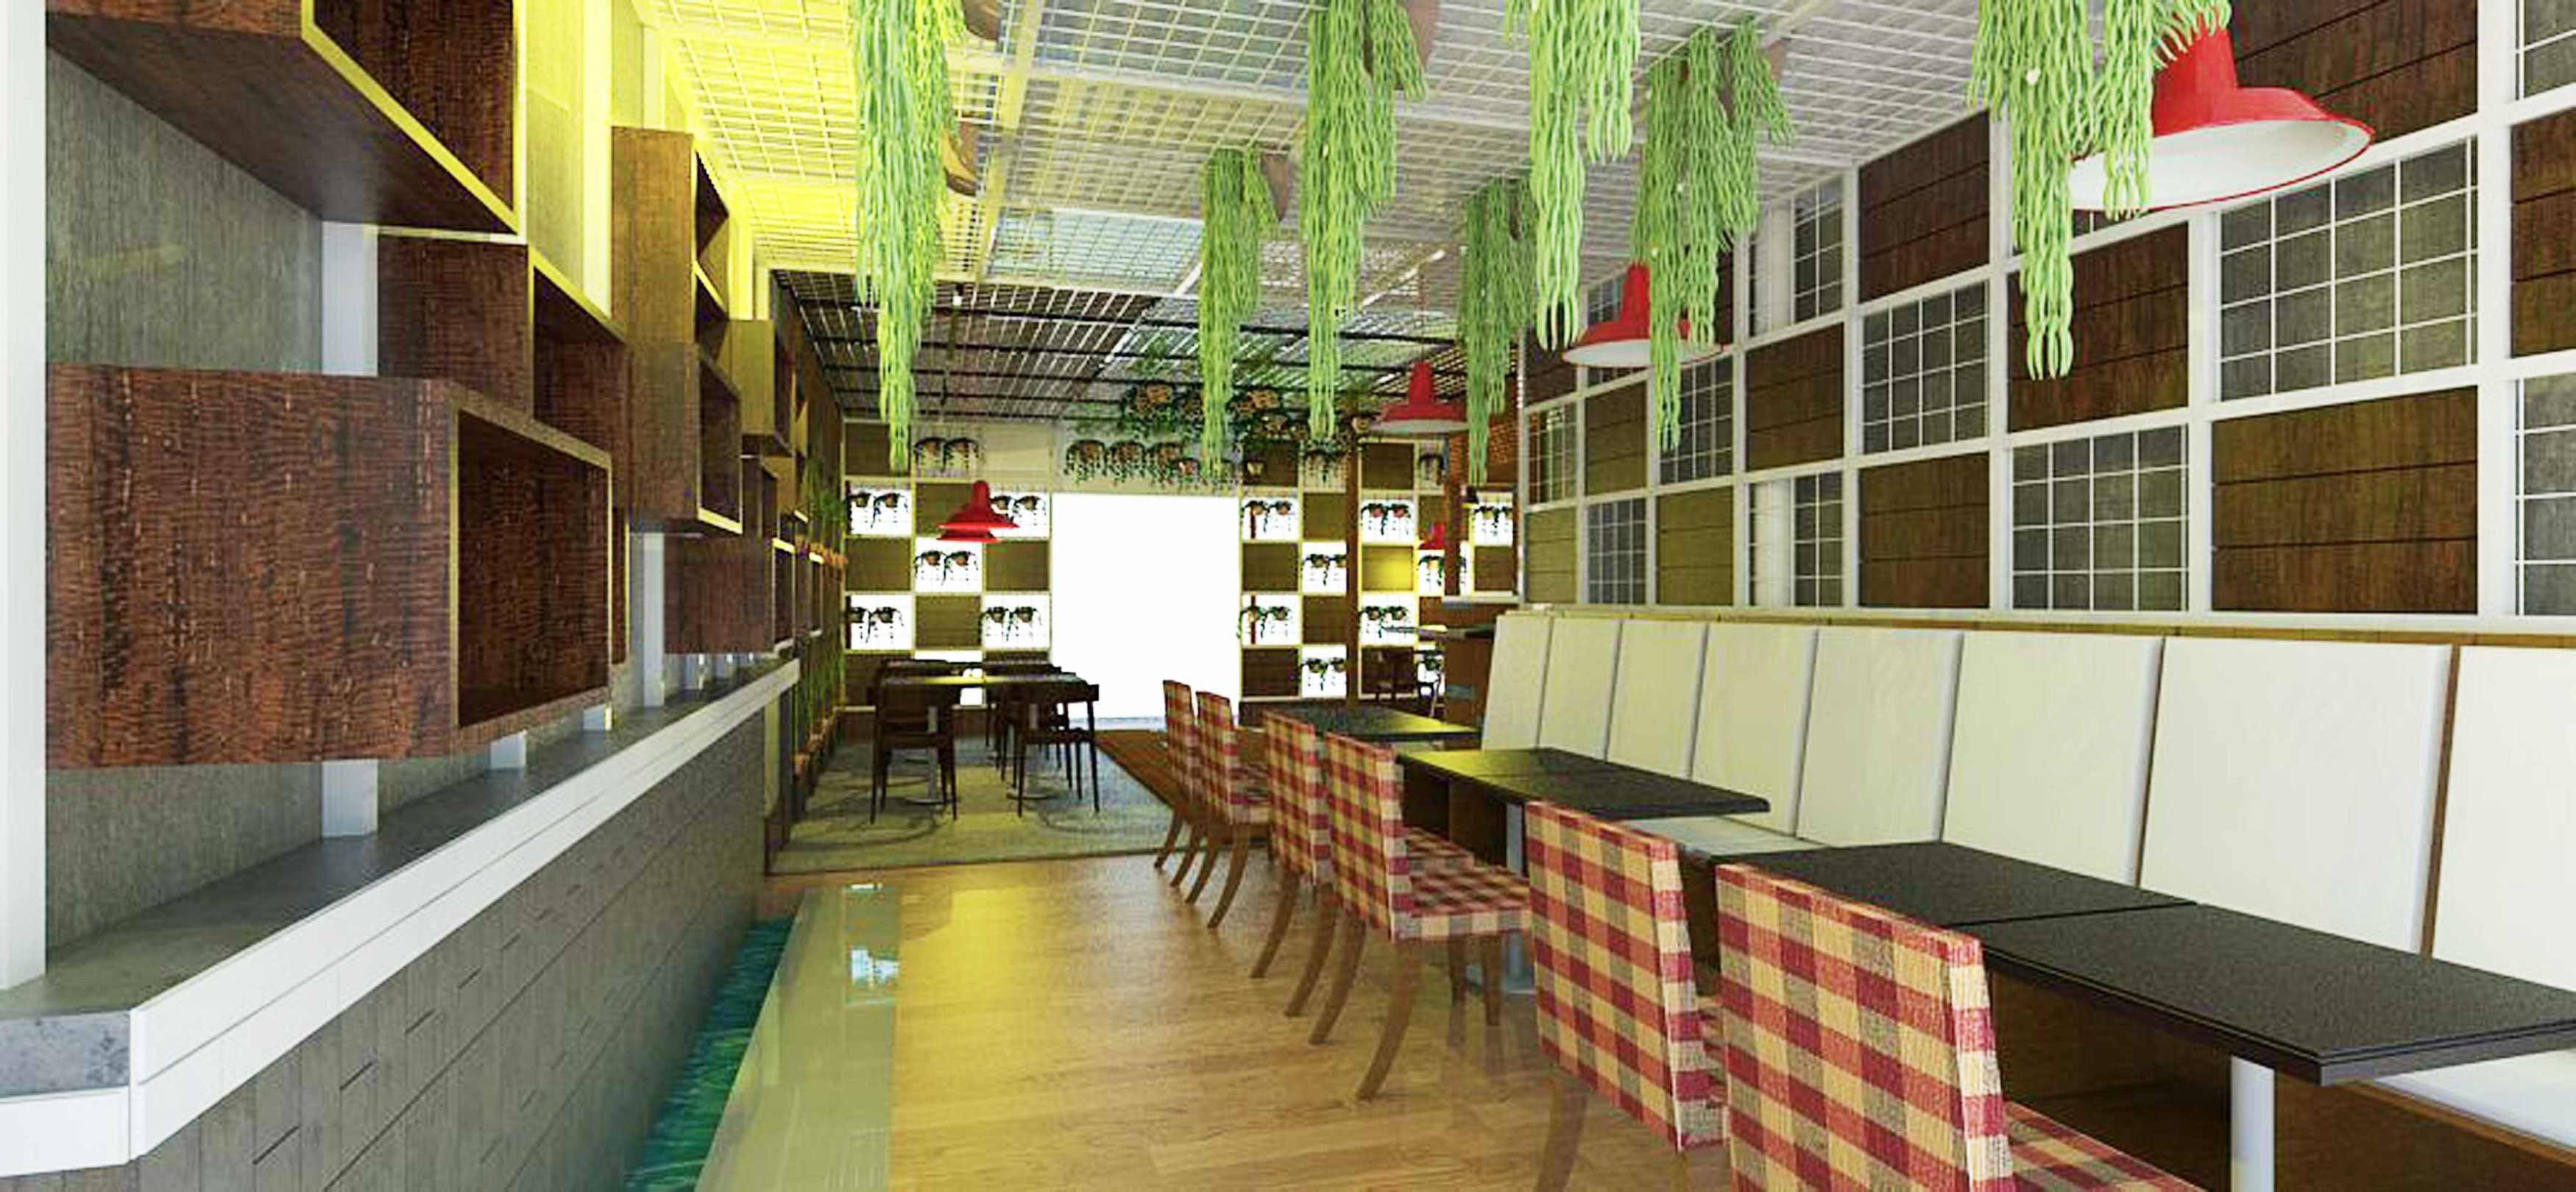 Danu Ega Ny A Restaurant Bandung, Kota Bandung, Jawa Barat, Indonesia Bandung, Kota Bandung, Jawa Barat, Indonesia Corner View Tropis  38993